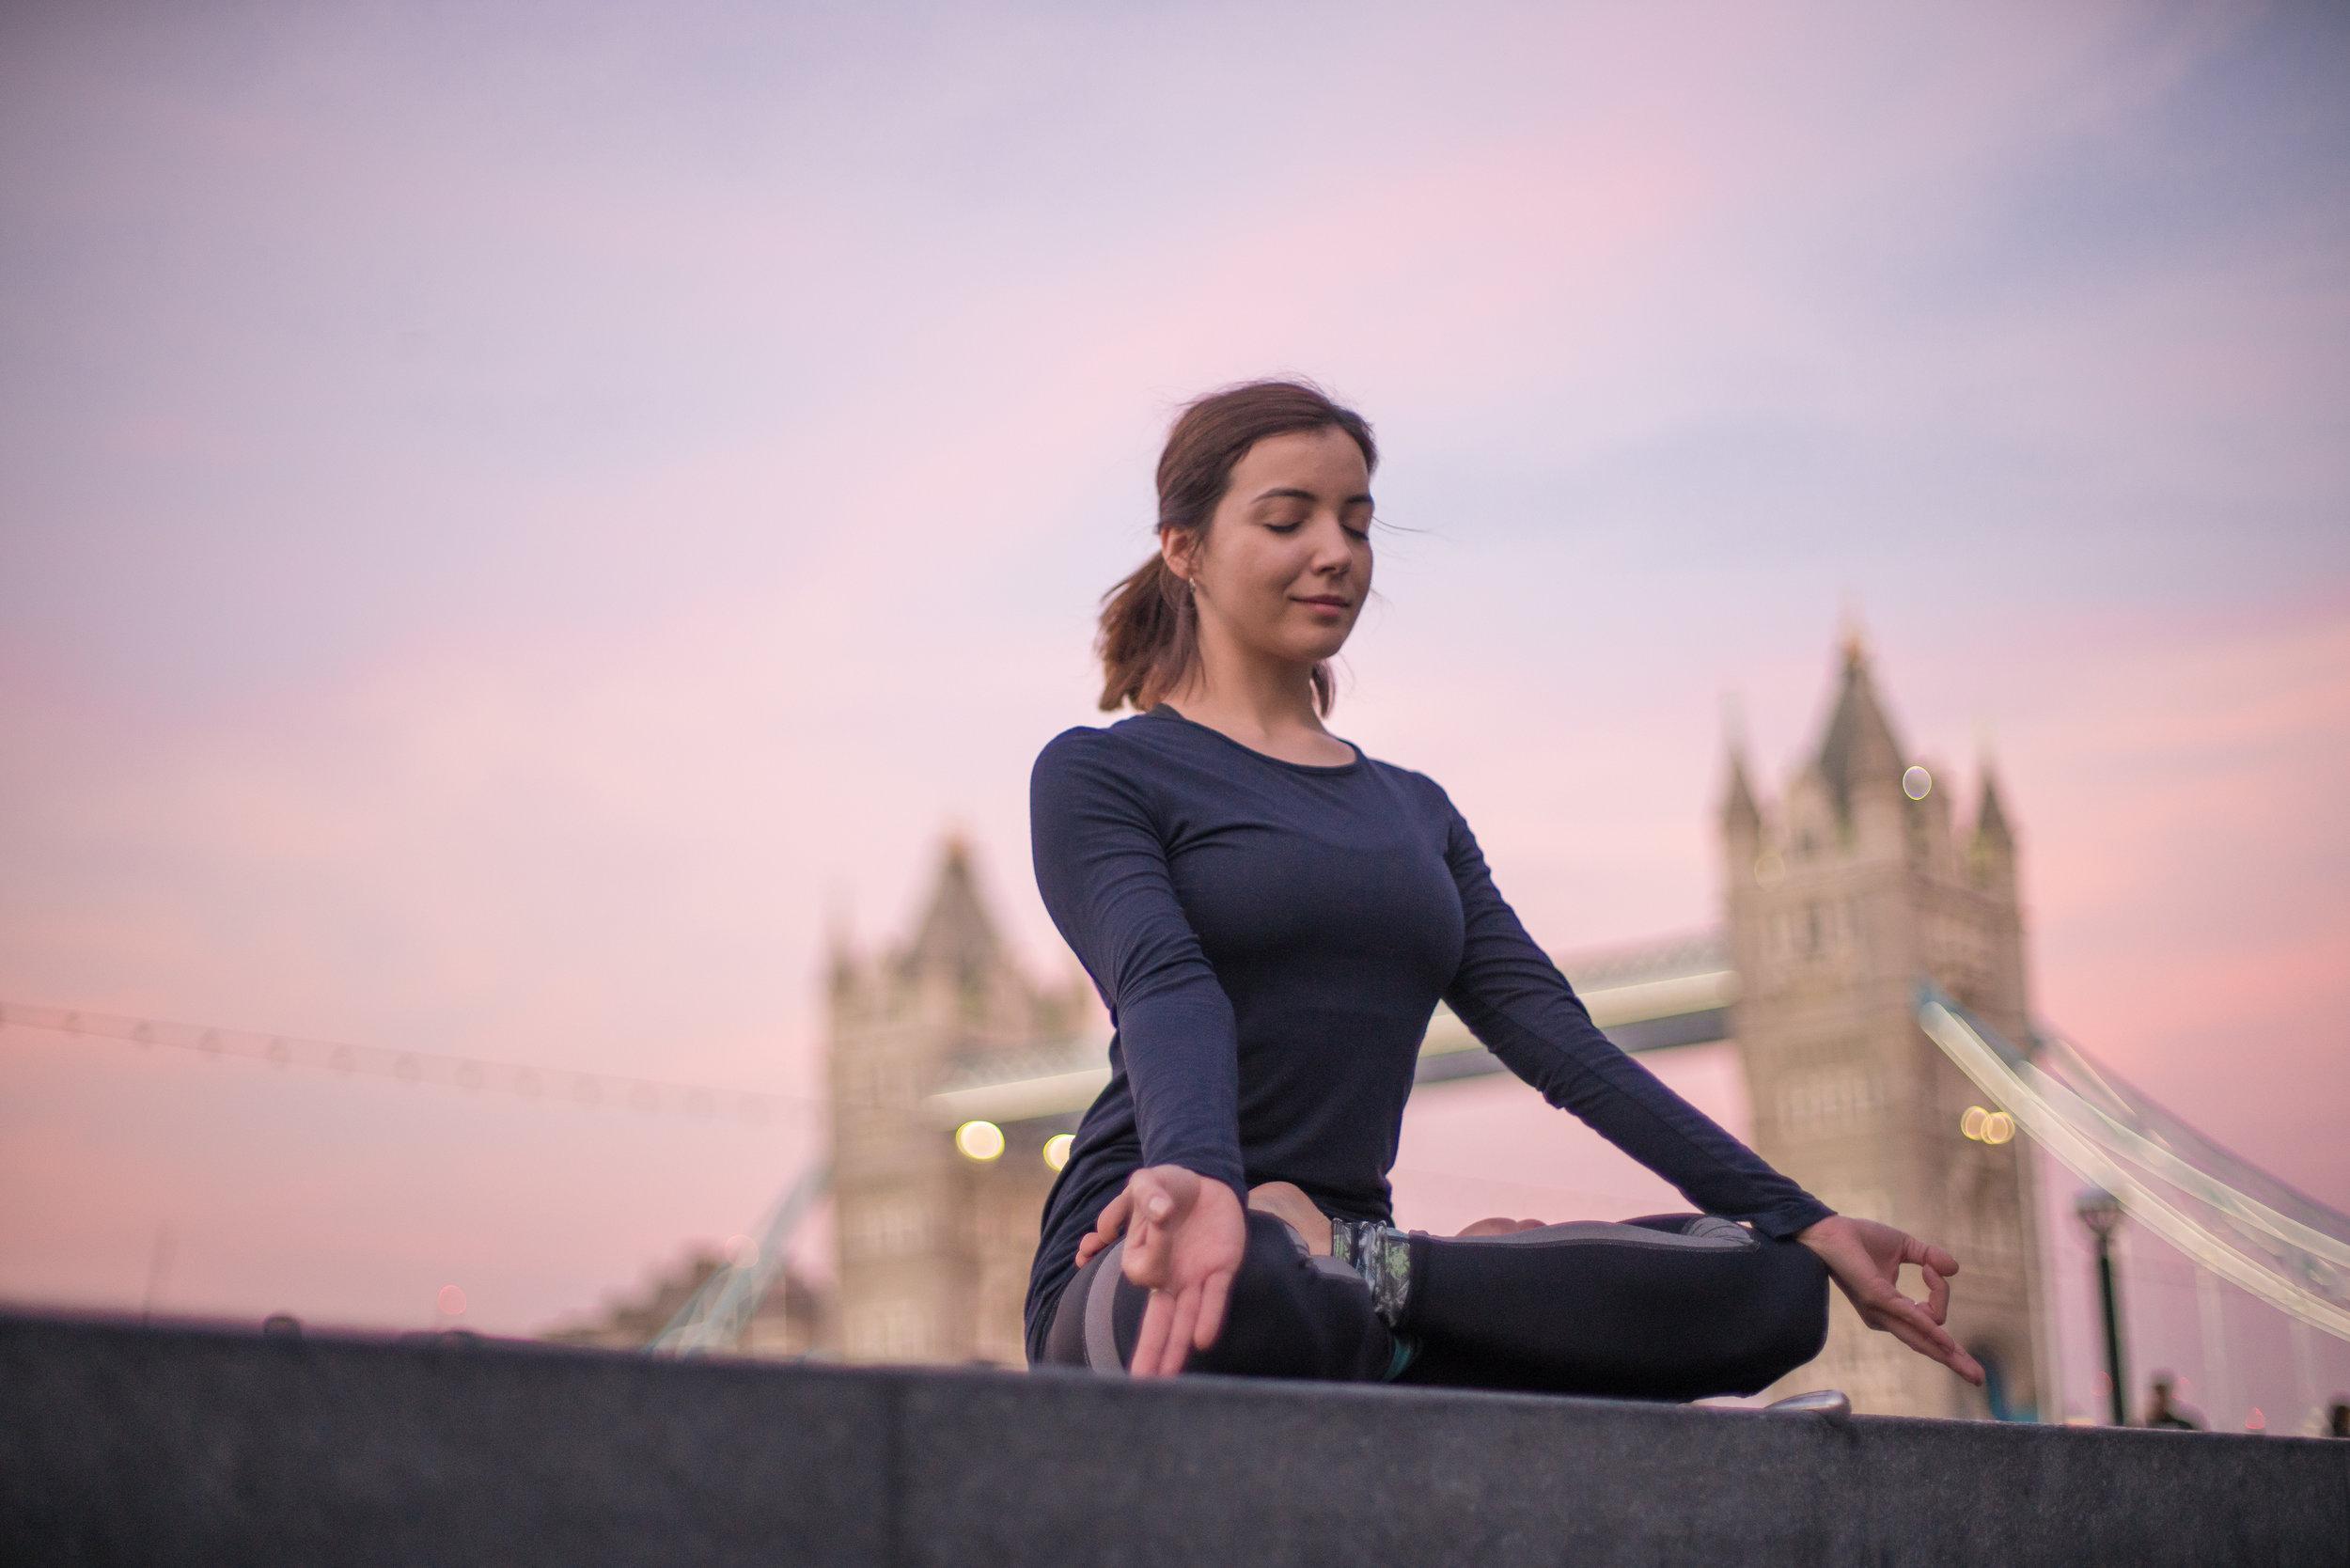 MoreYoga_International Yoga Day_Iva Emilova_The Scoop_Credit Maria Nakhmanovich Content Crib.jpg